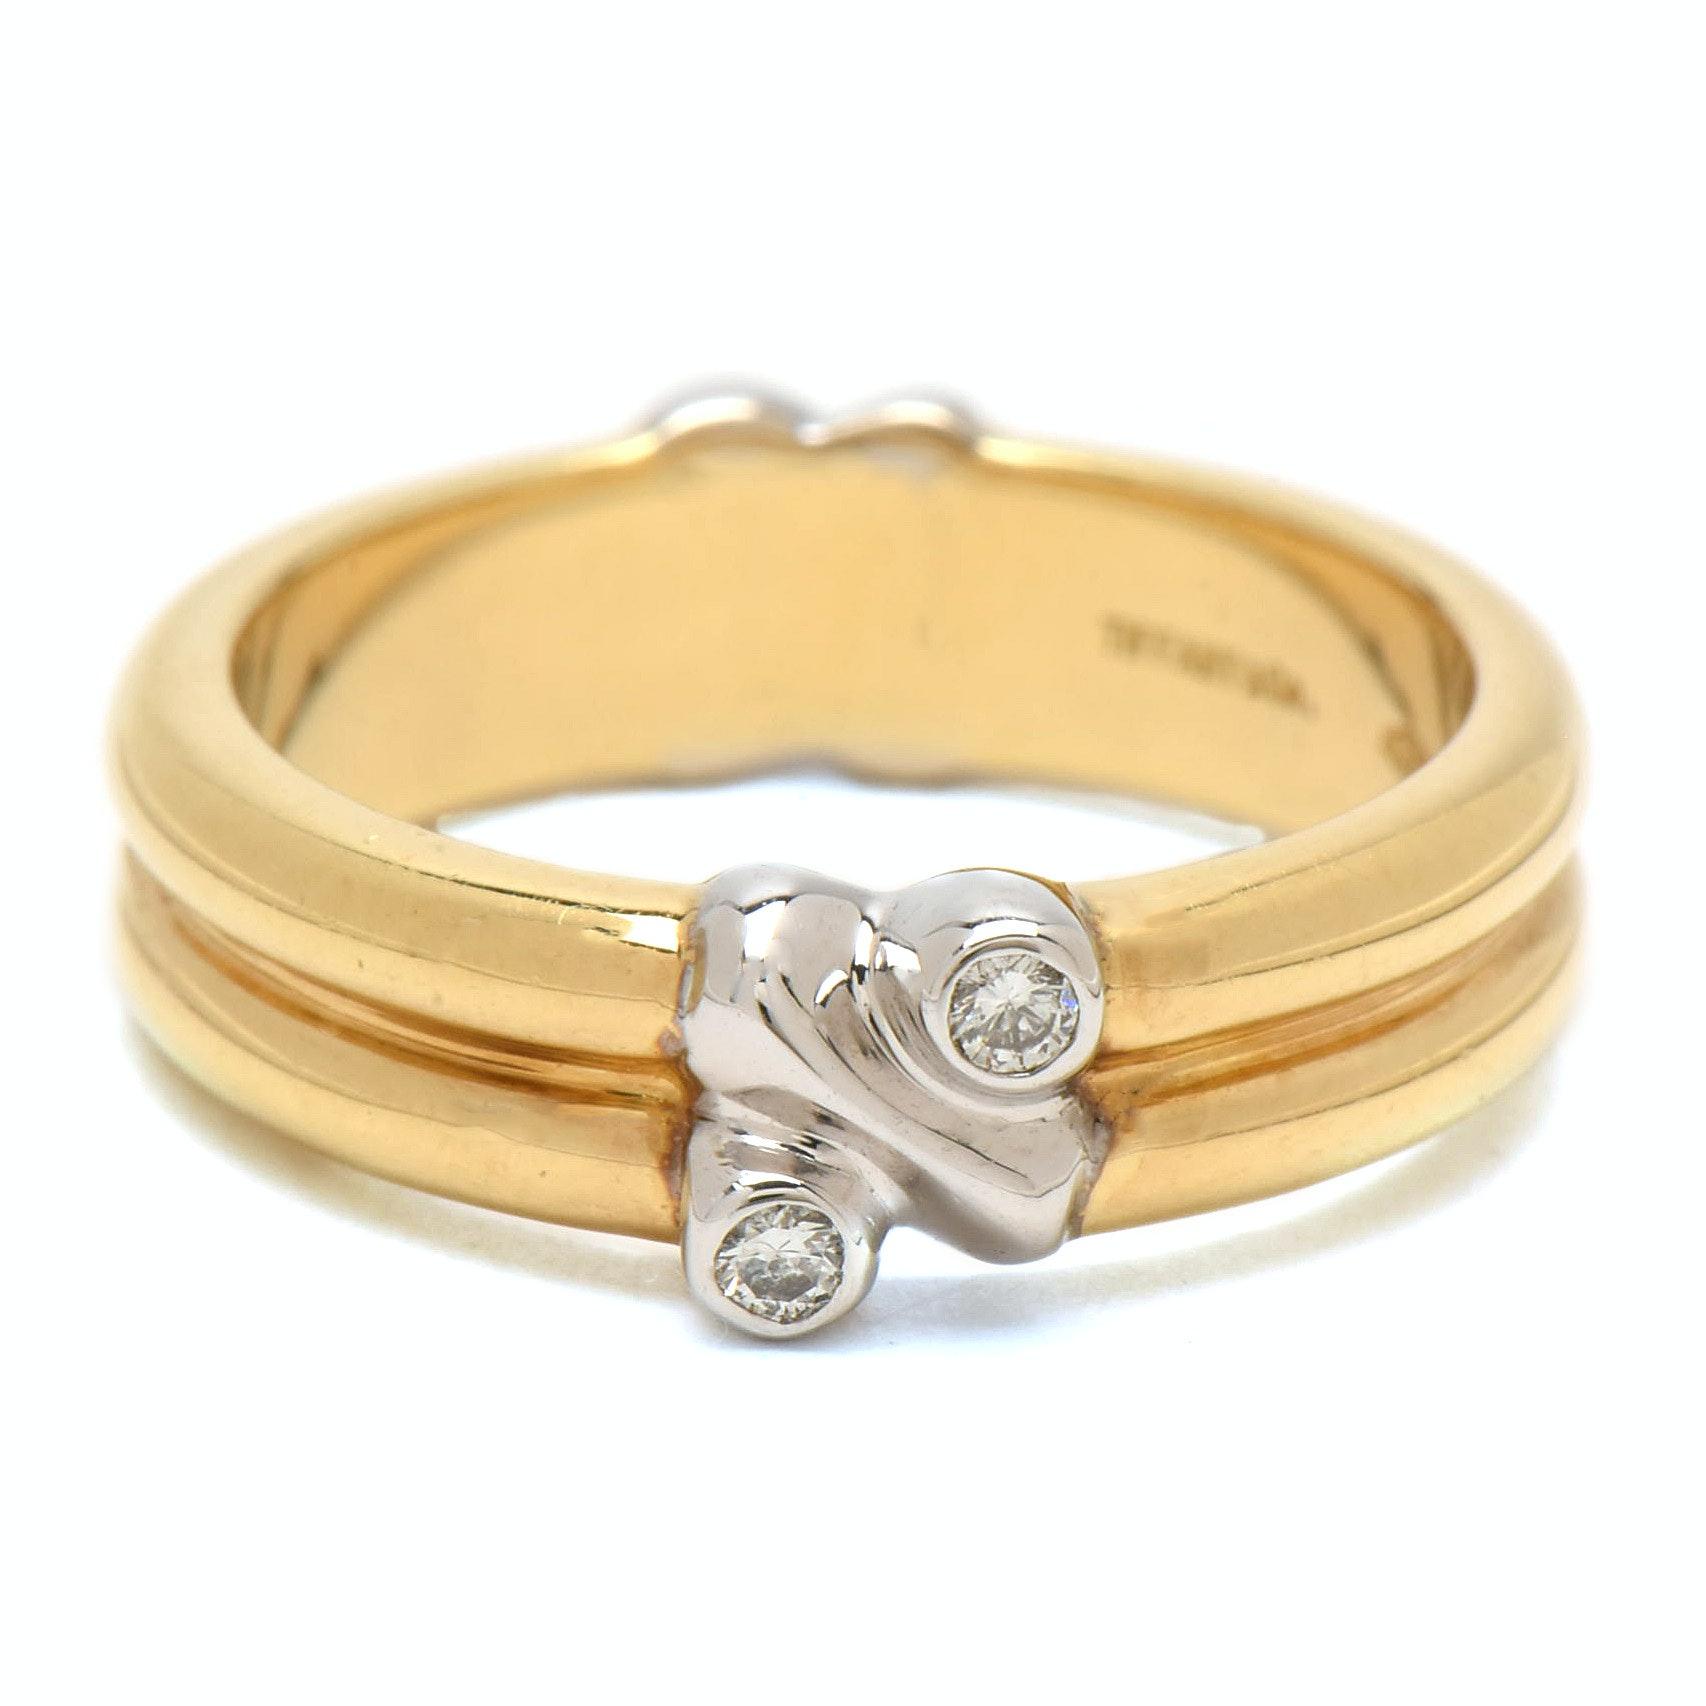 Tiffany & Co.  Italian 18K Yellow Gold Band with Diamonds